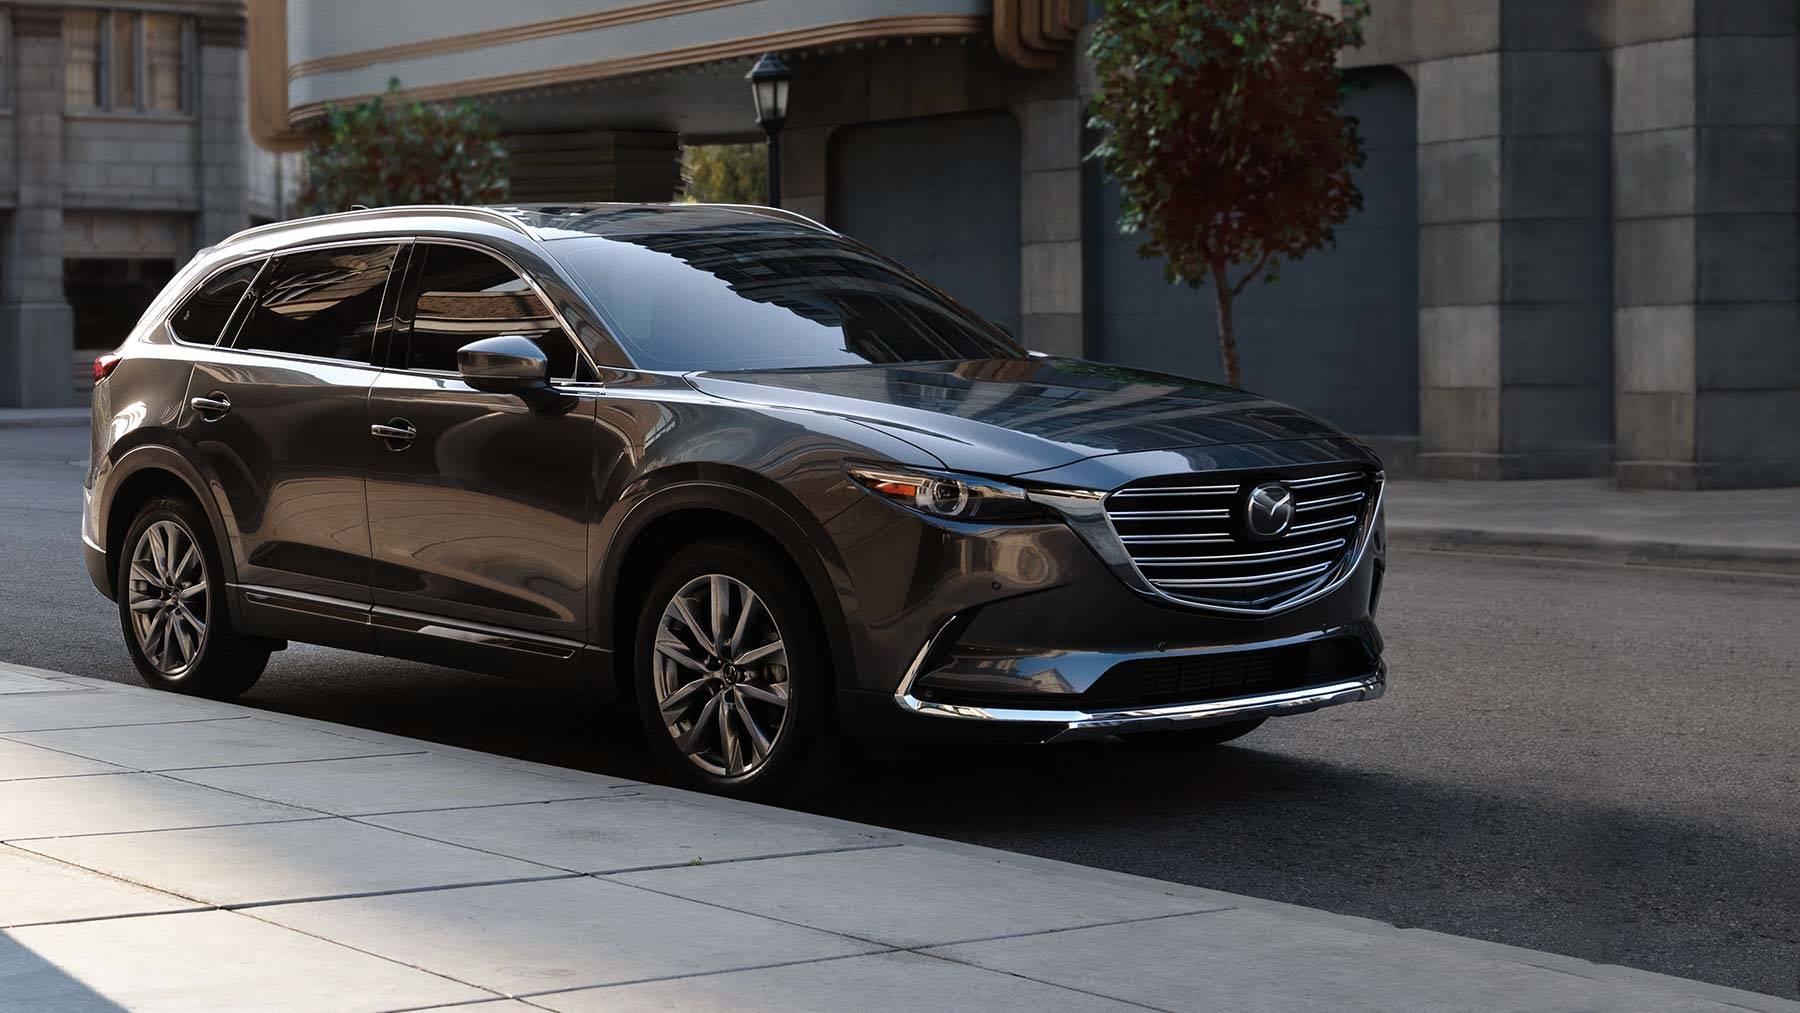 2019 Mazda CX-9 Leasing near Sacramento, CA